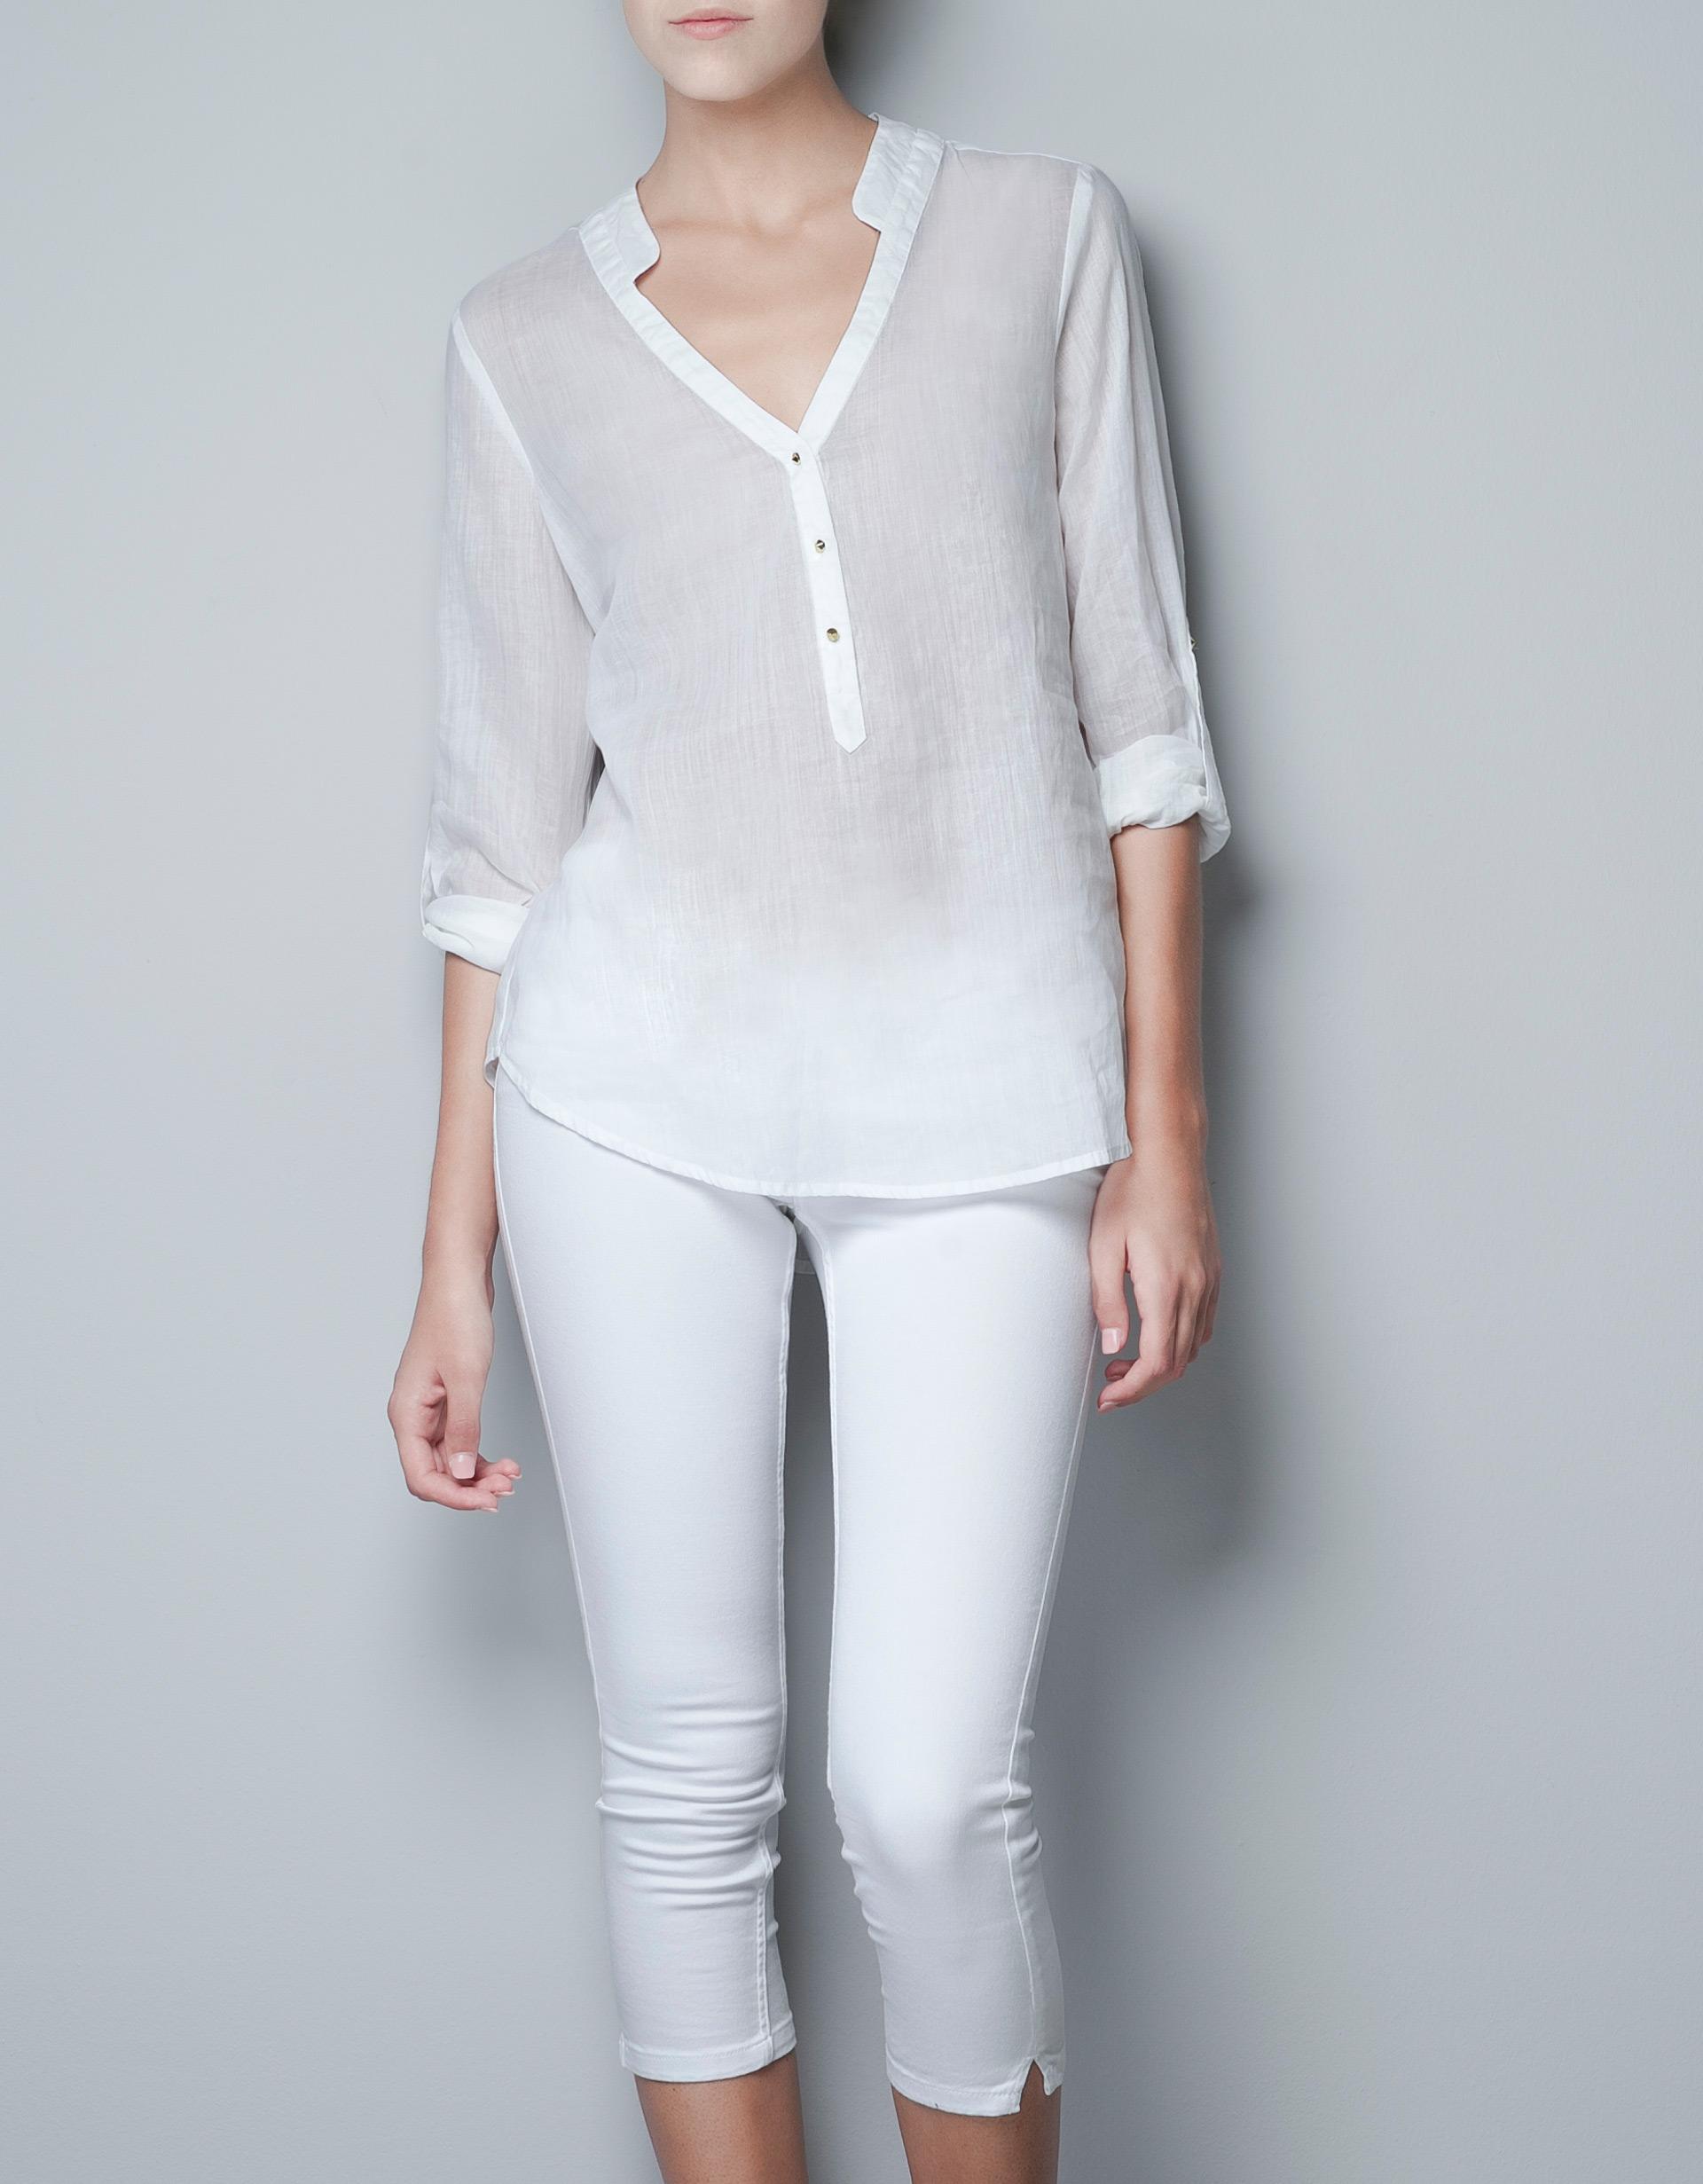 Zara White Long Sleeve Blouse 84